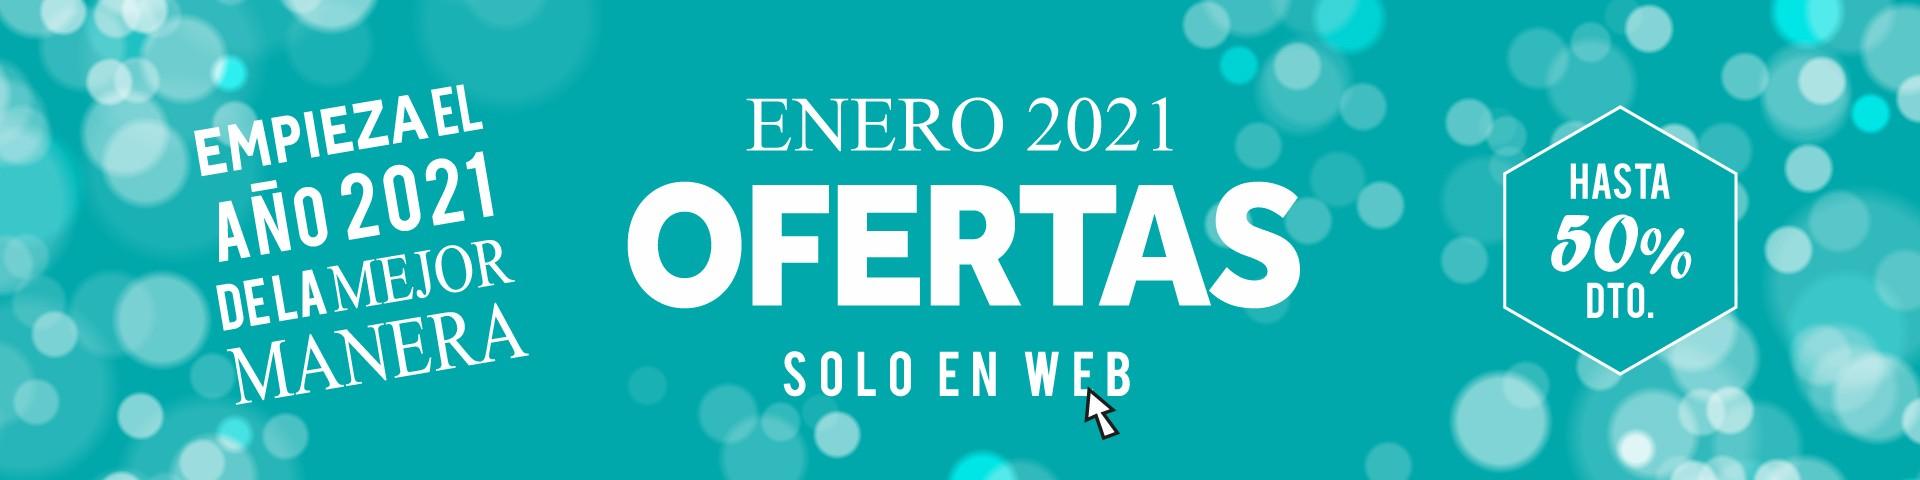 OFERTAS WEB ENERO 2021